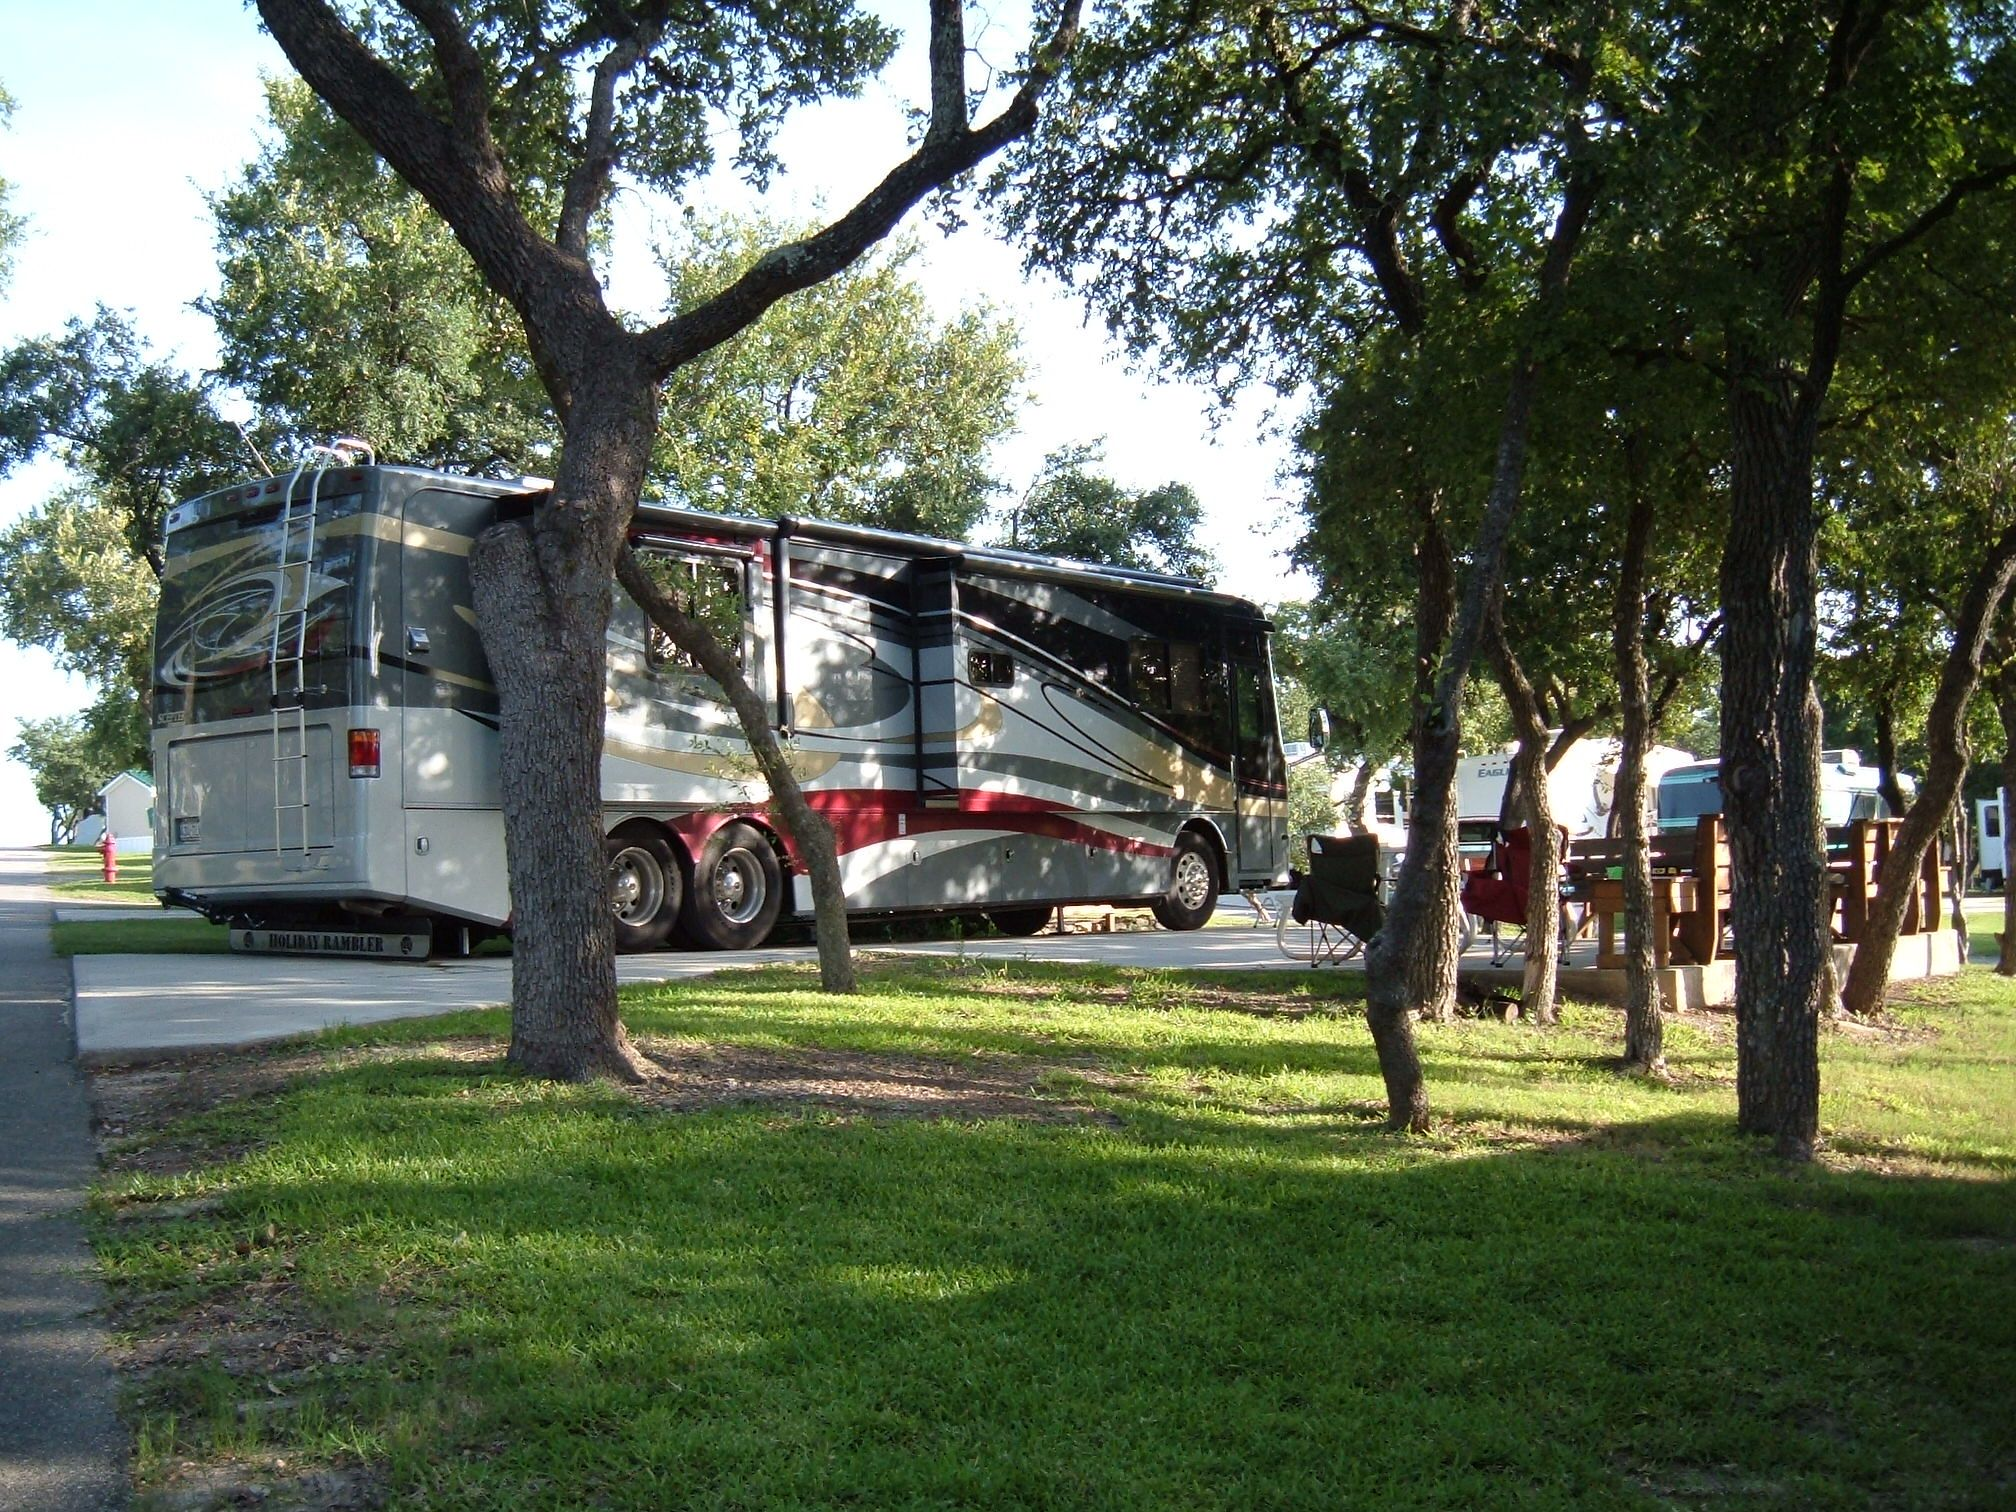 Blazing Star Luxury Rv Resort - San Antonio, Texas